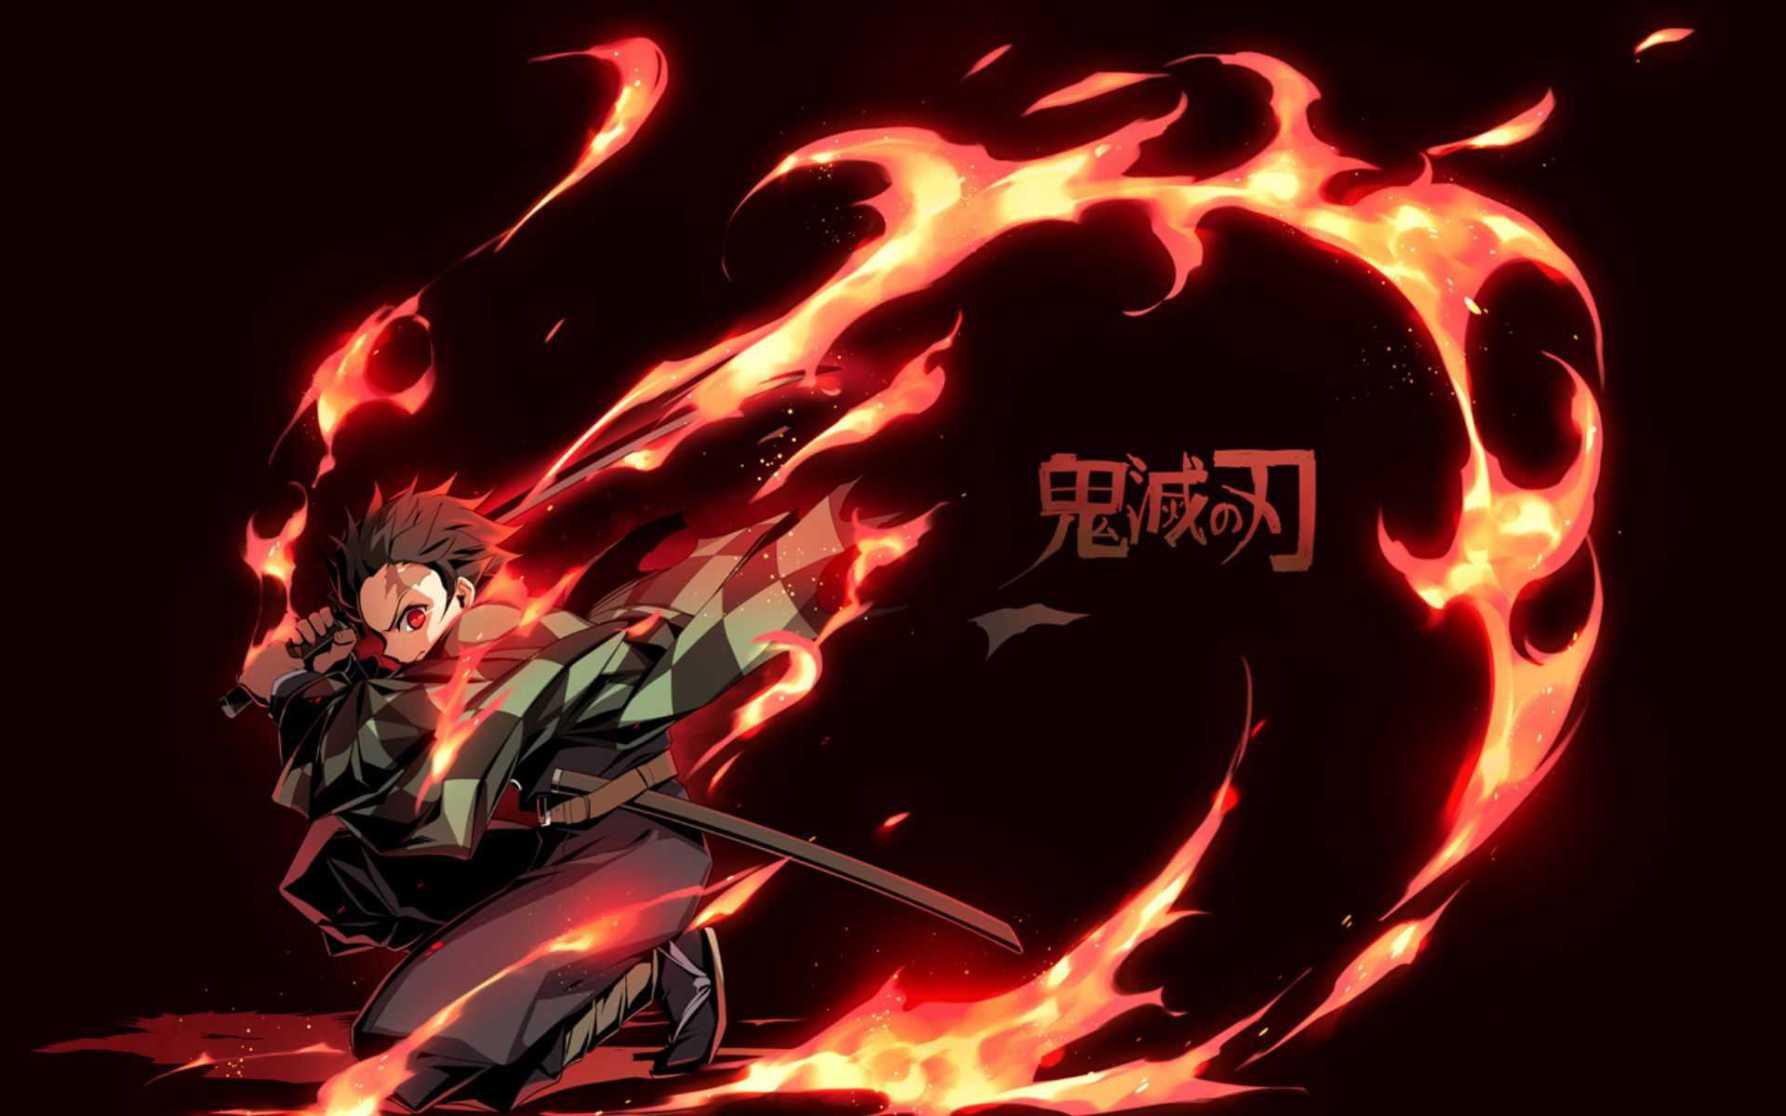 Power of Tanjiro Kamado in Demon Slayer Explained